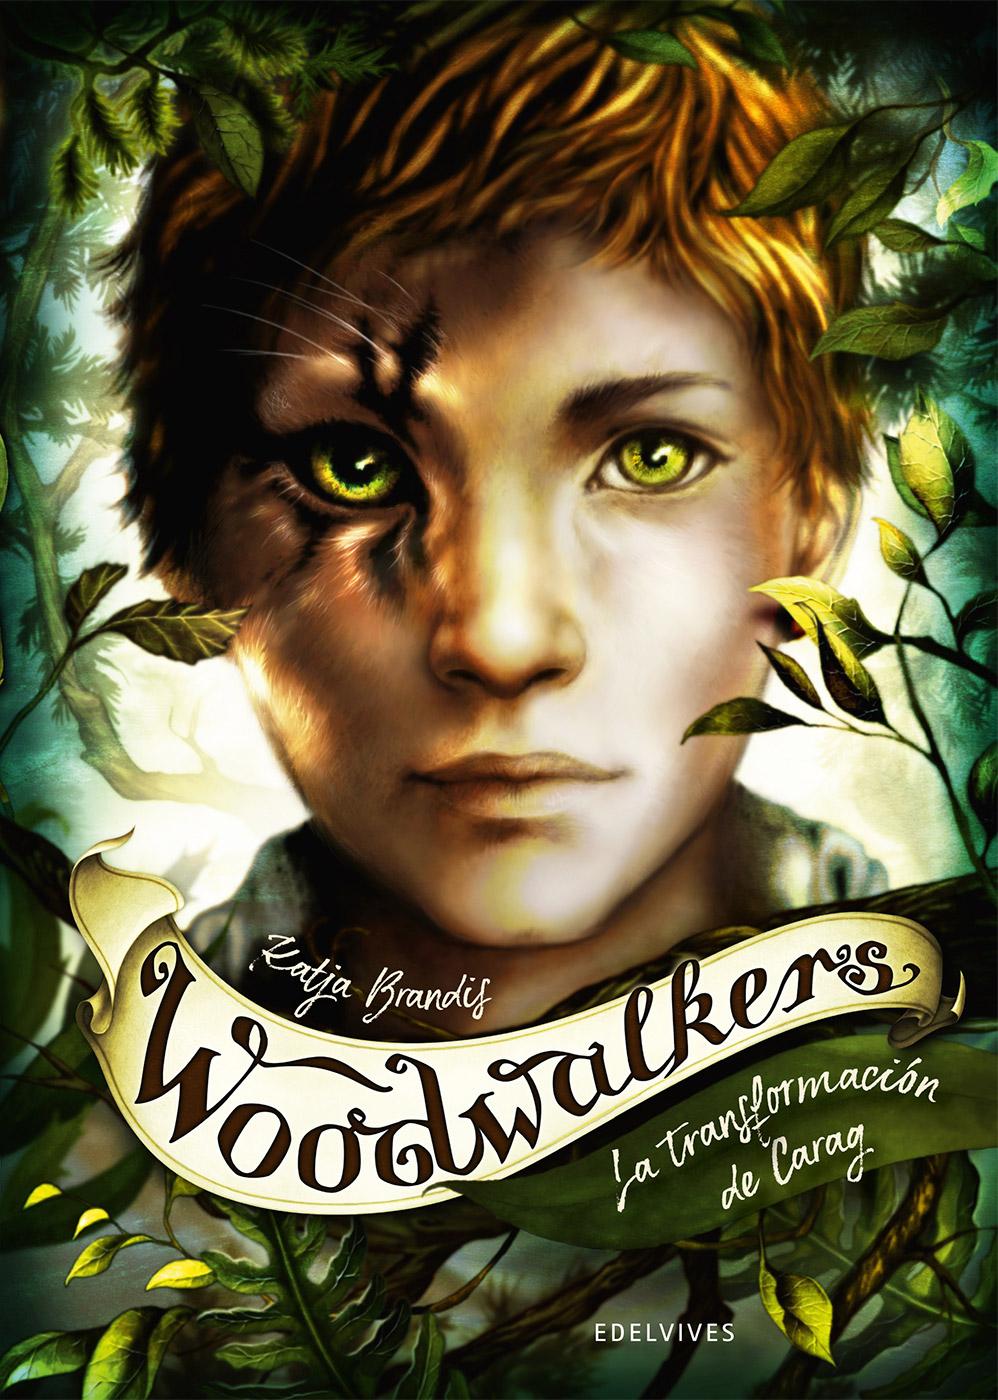 La transformacion de Carag (Woodwalkers 1) - Katja Brandis